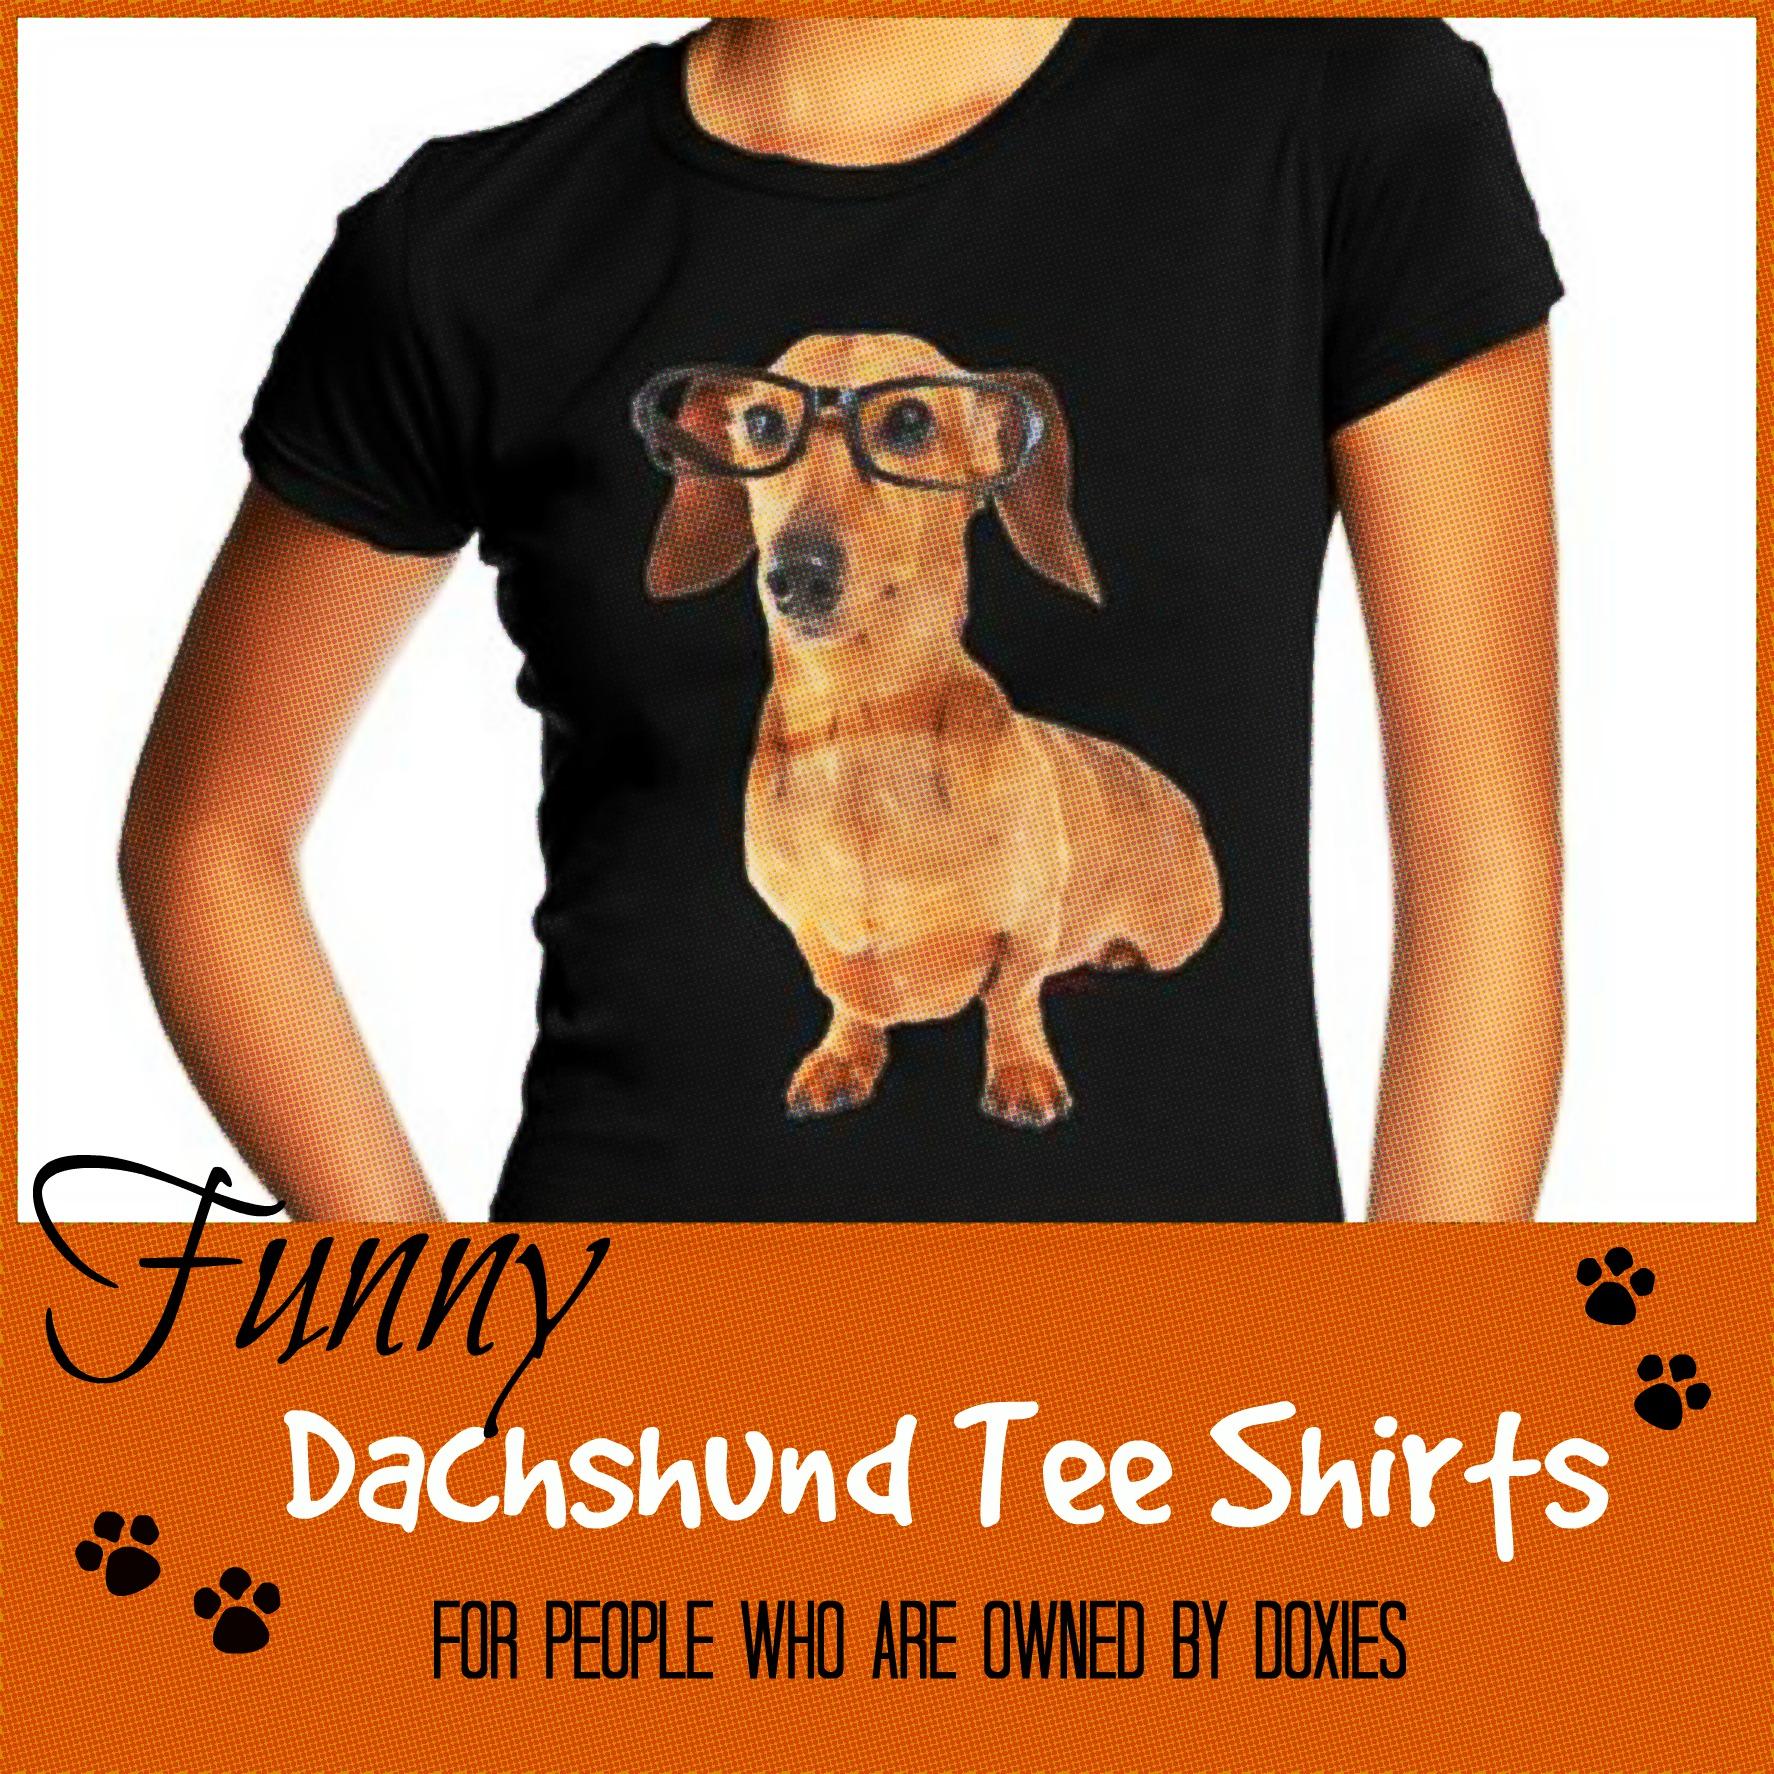 dachshund t shirts gifts